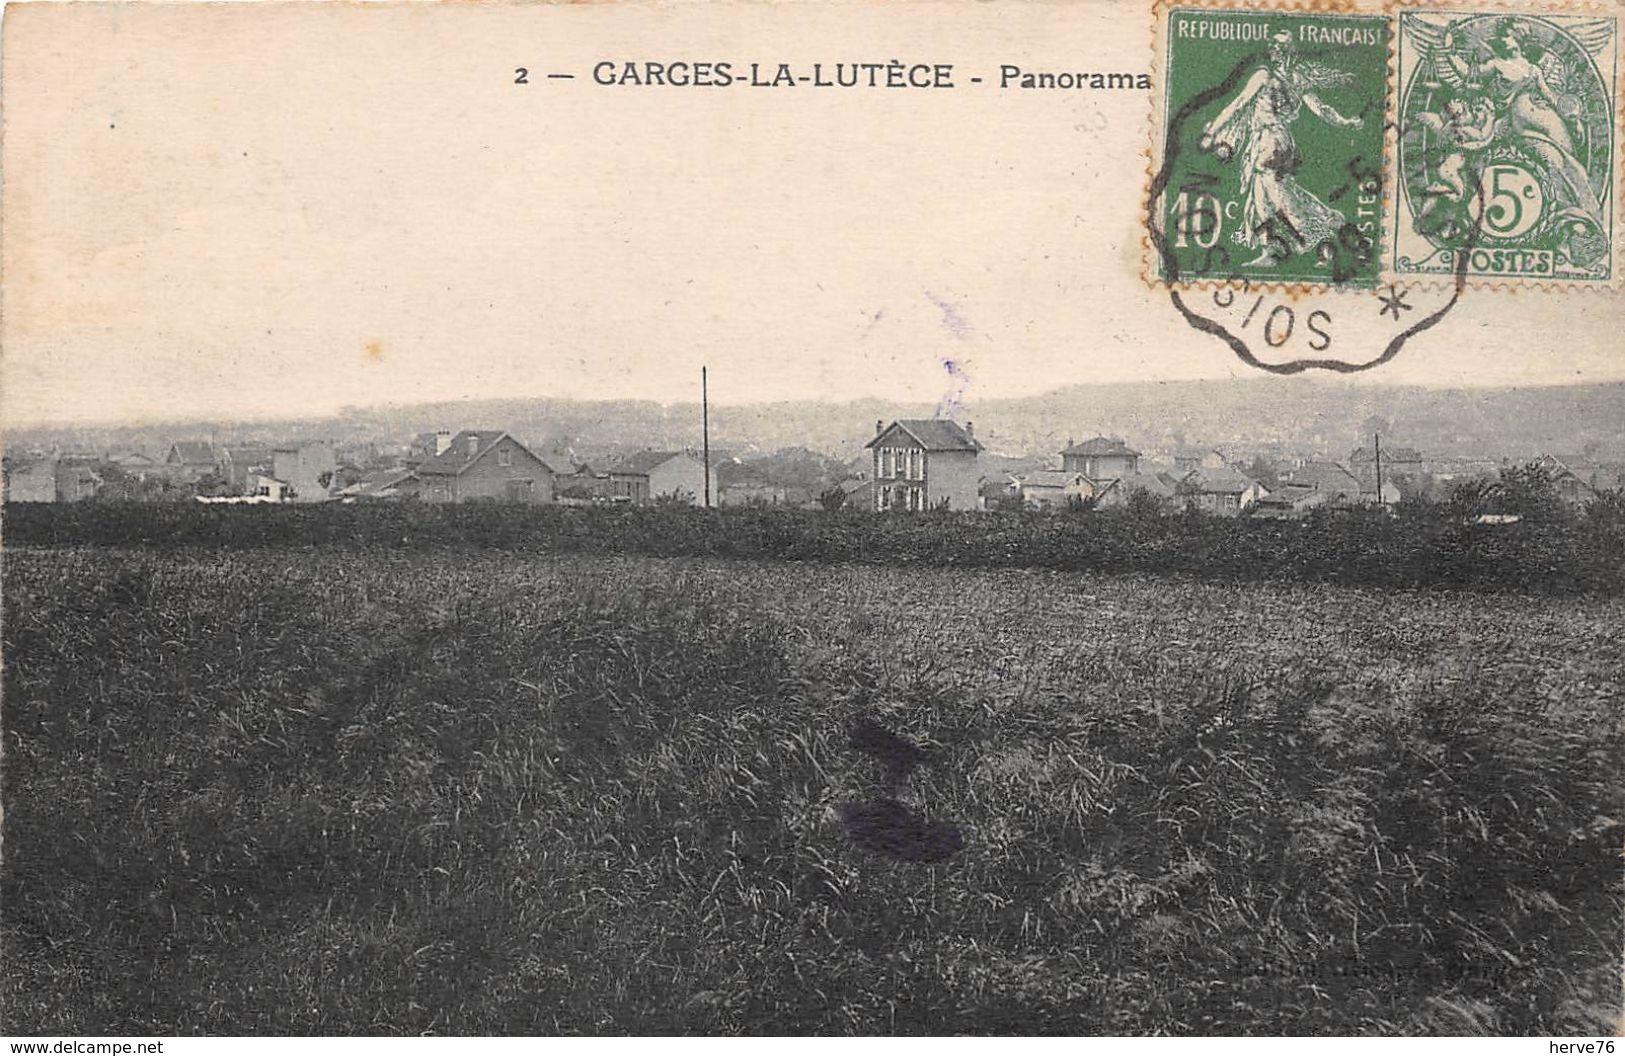 GARGES LA LUTECE - Panorama - France